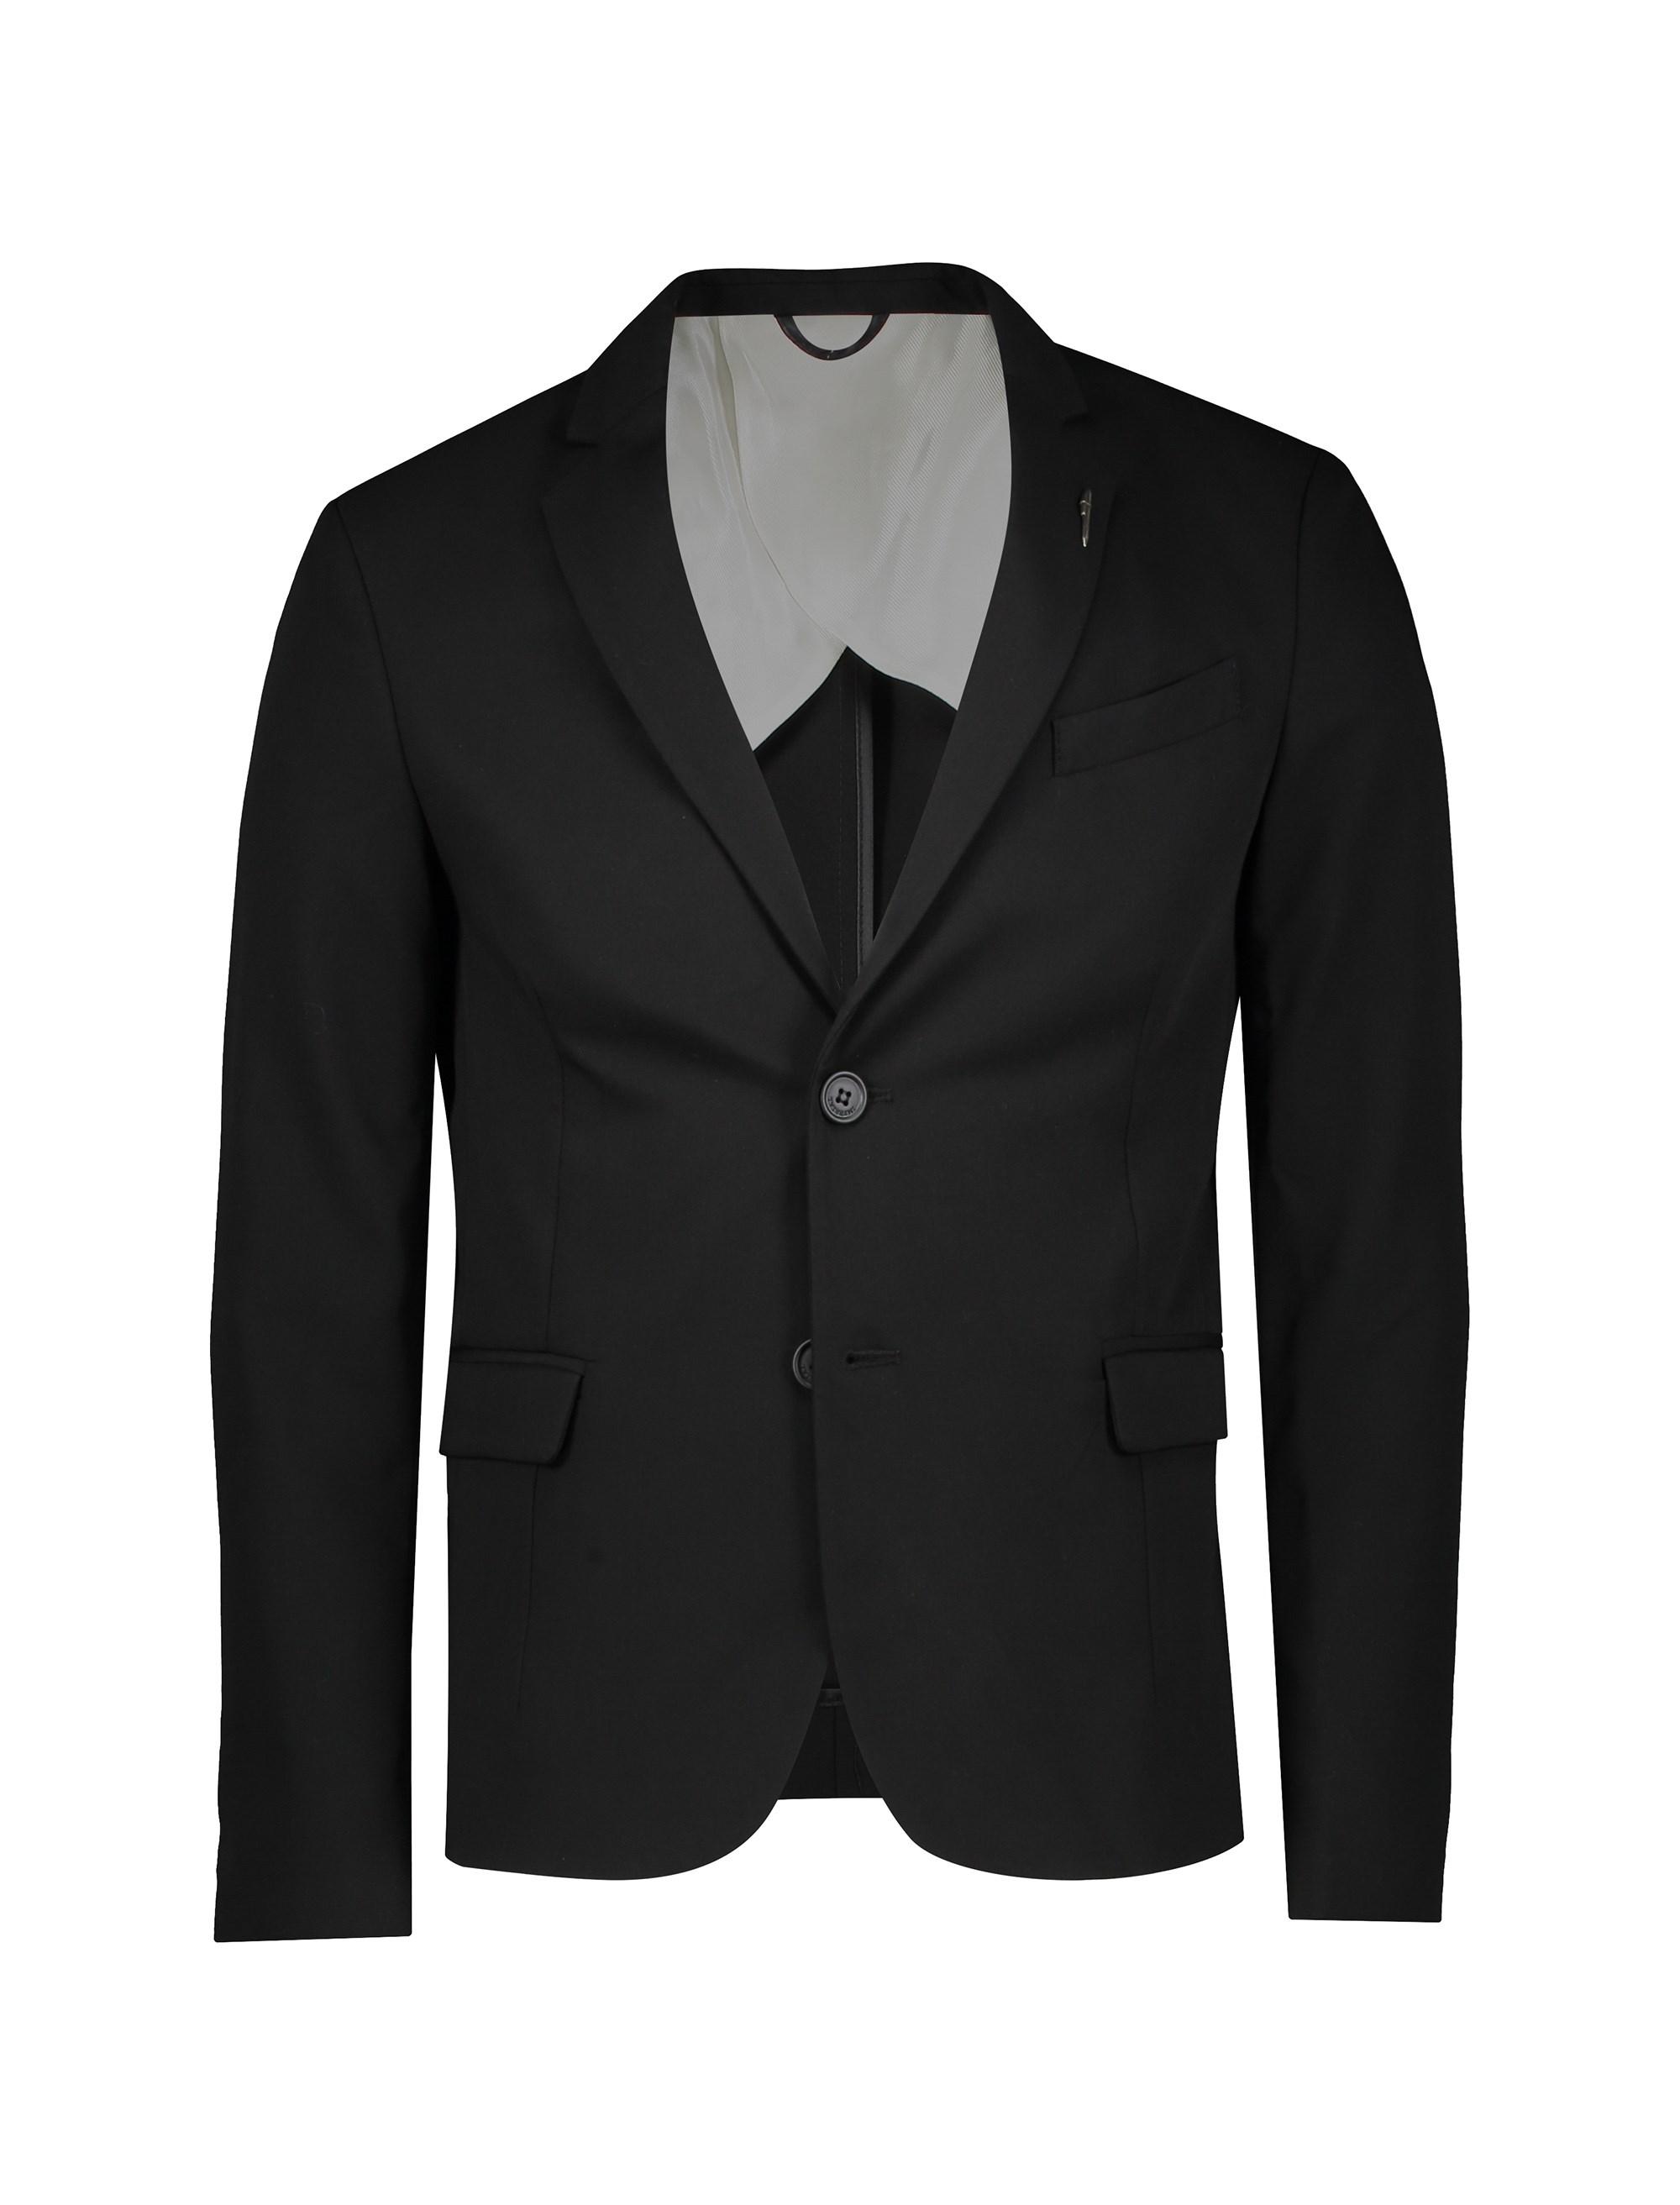 کت تک رسمی مردانه - امپریال